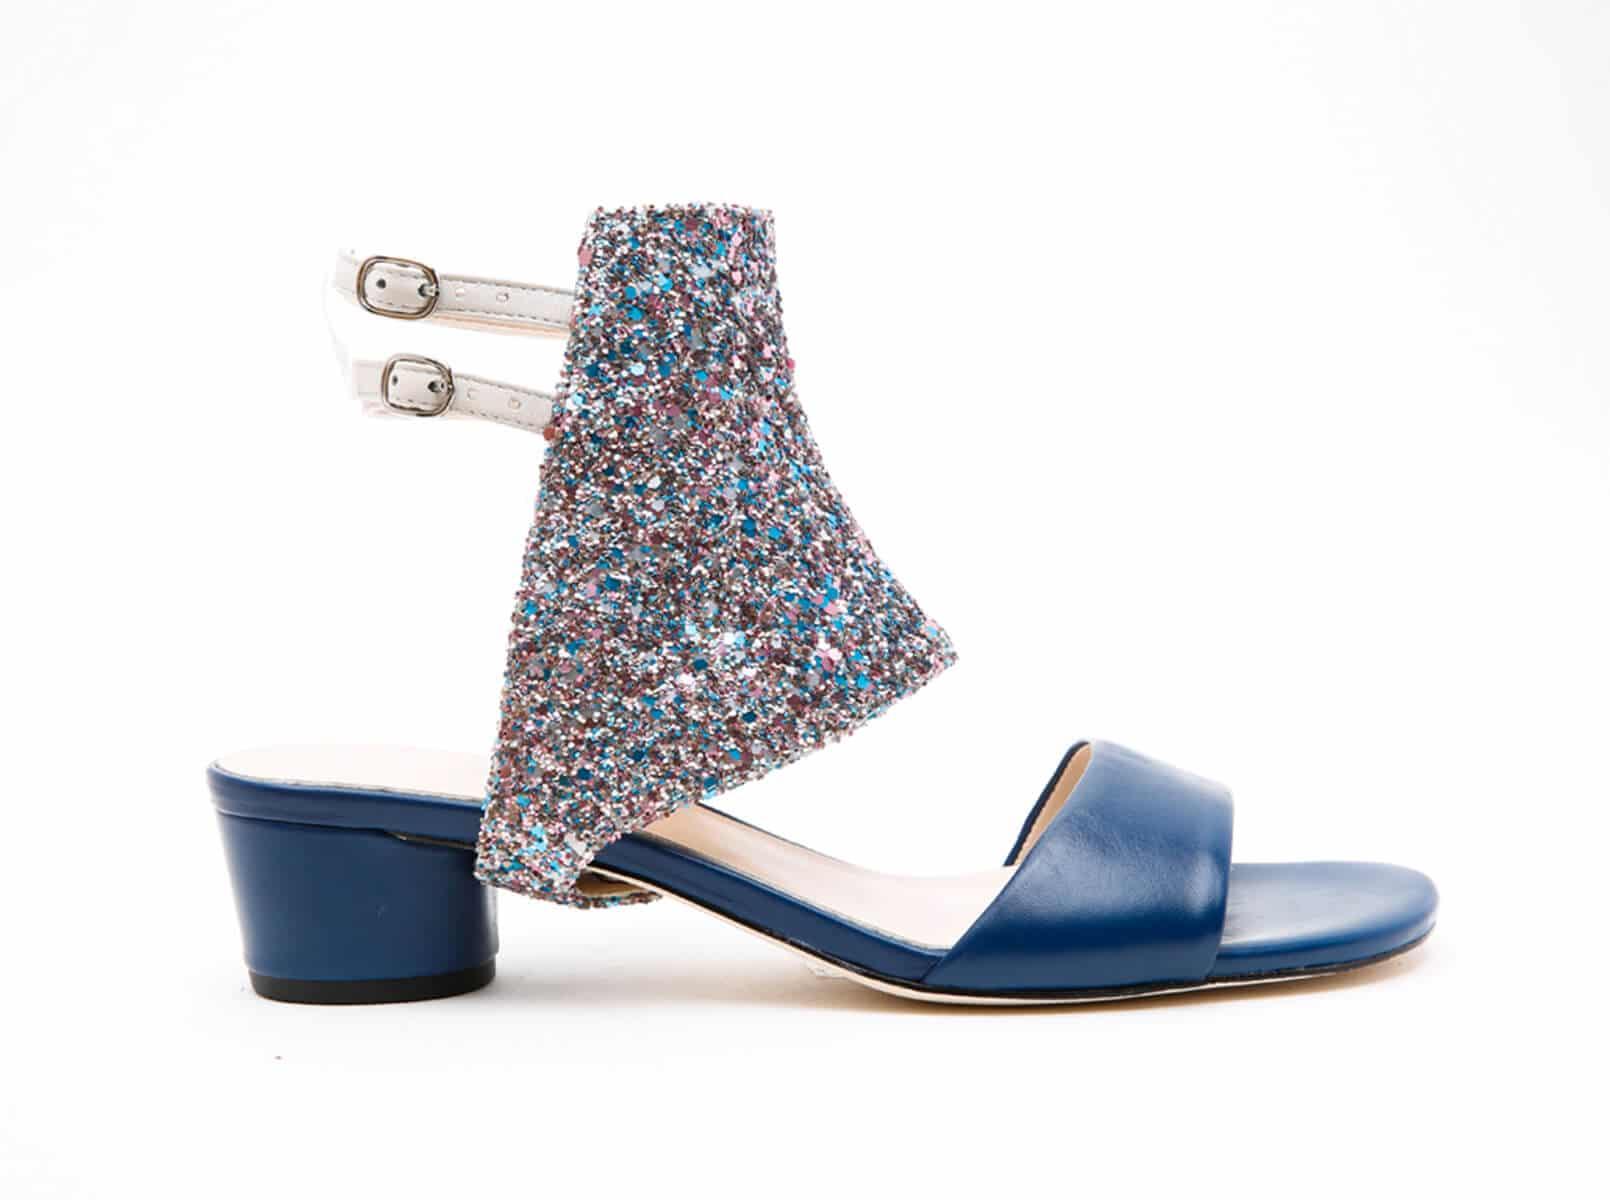 alterre bianca pixel glitter evening sky sandal